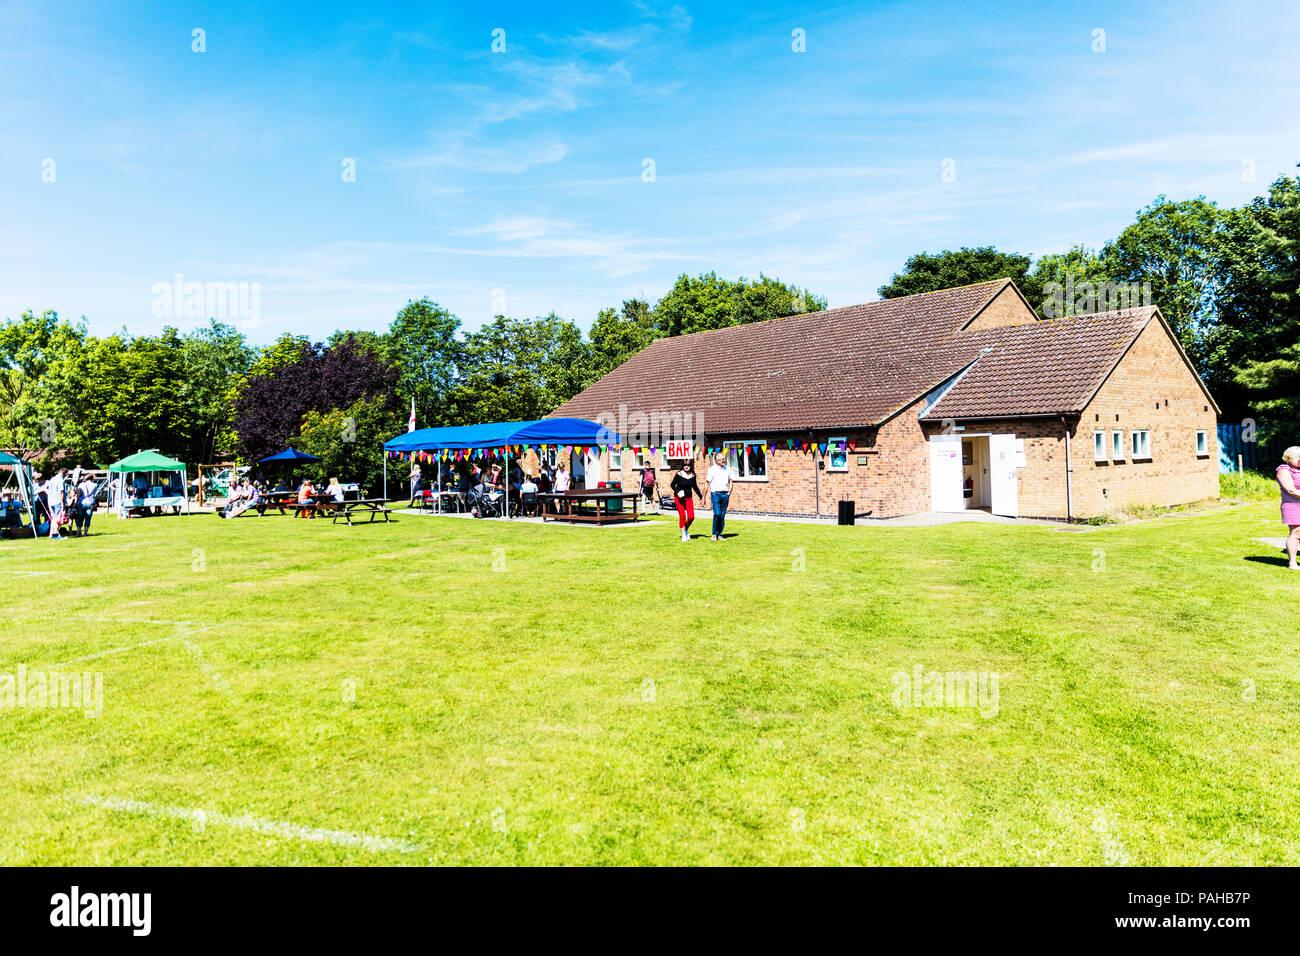 Legbourne village Hall, village halls UK, Legbourne community centre, UK village halls, village hall, community centres, community centres UK, halls, - Stock Image